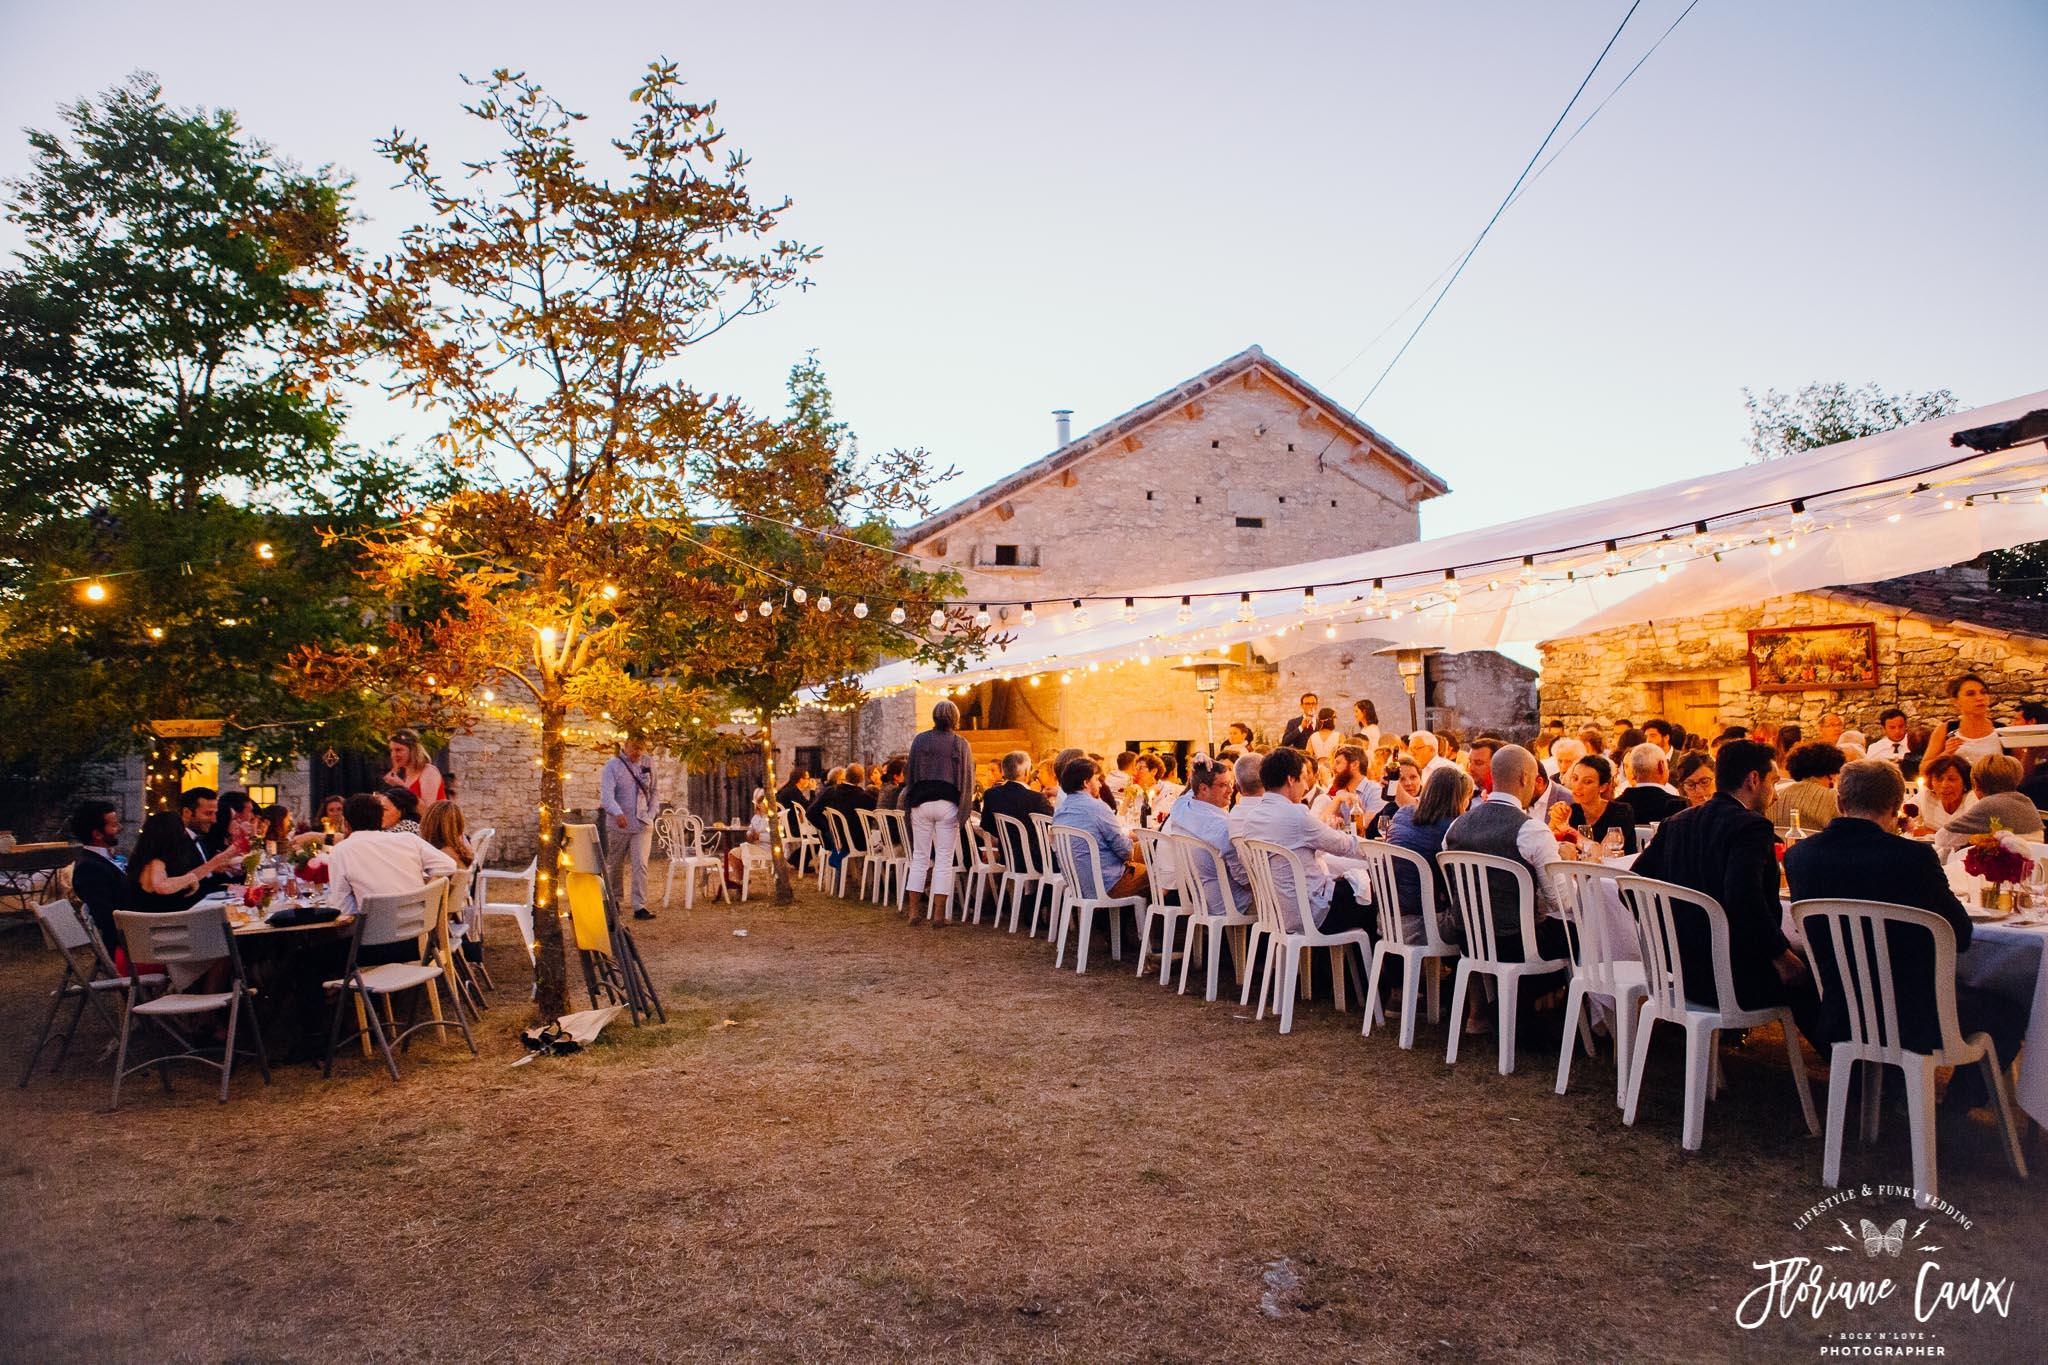 my-dear-festival-party-mariage-chez-soi-7